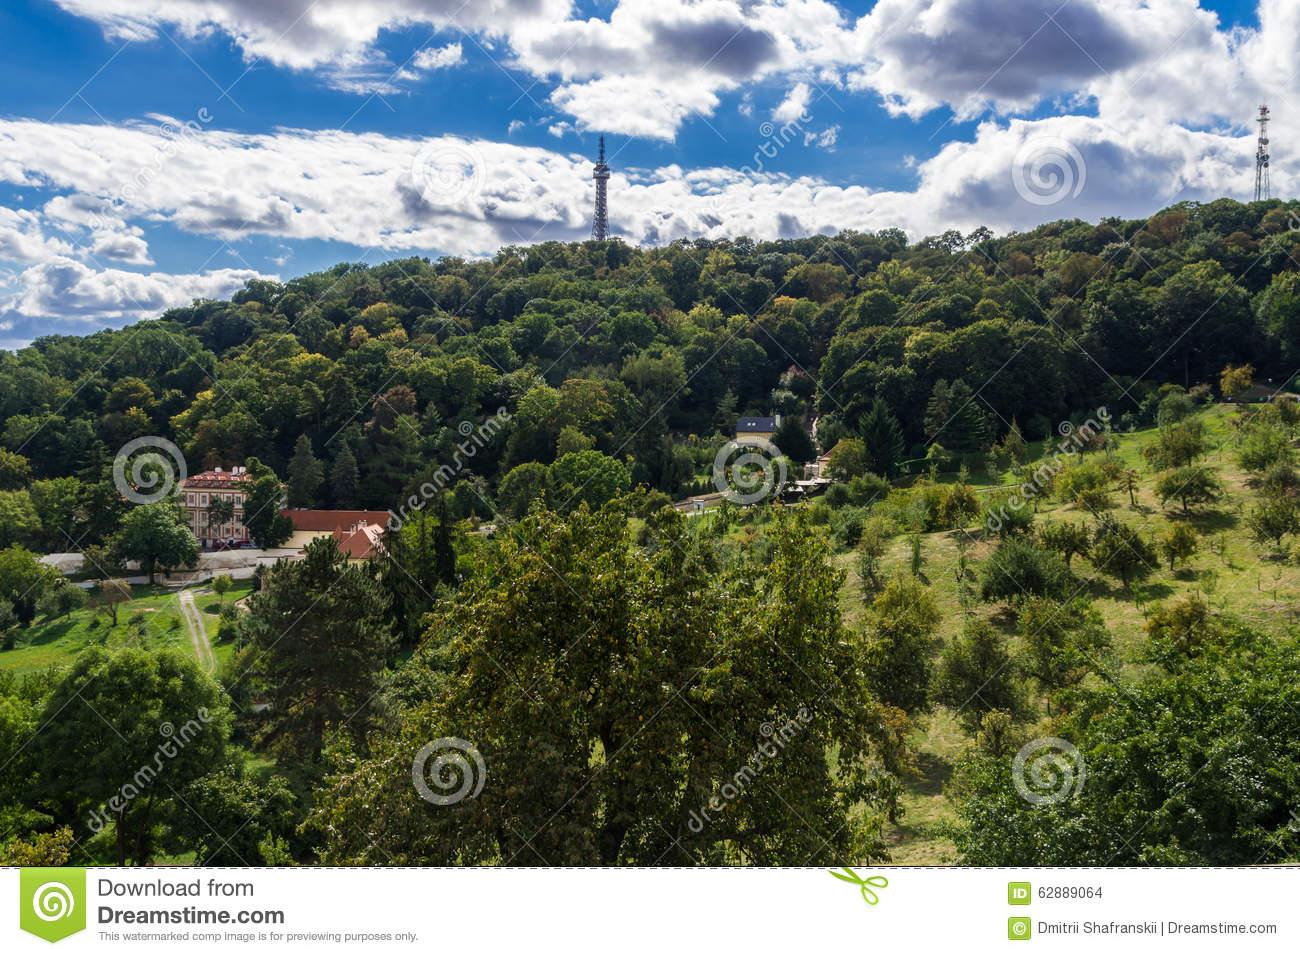 Petrin Tower Royalty Free Stock Image.